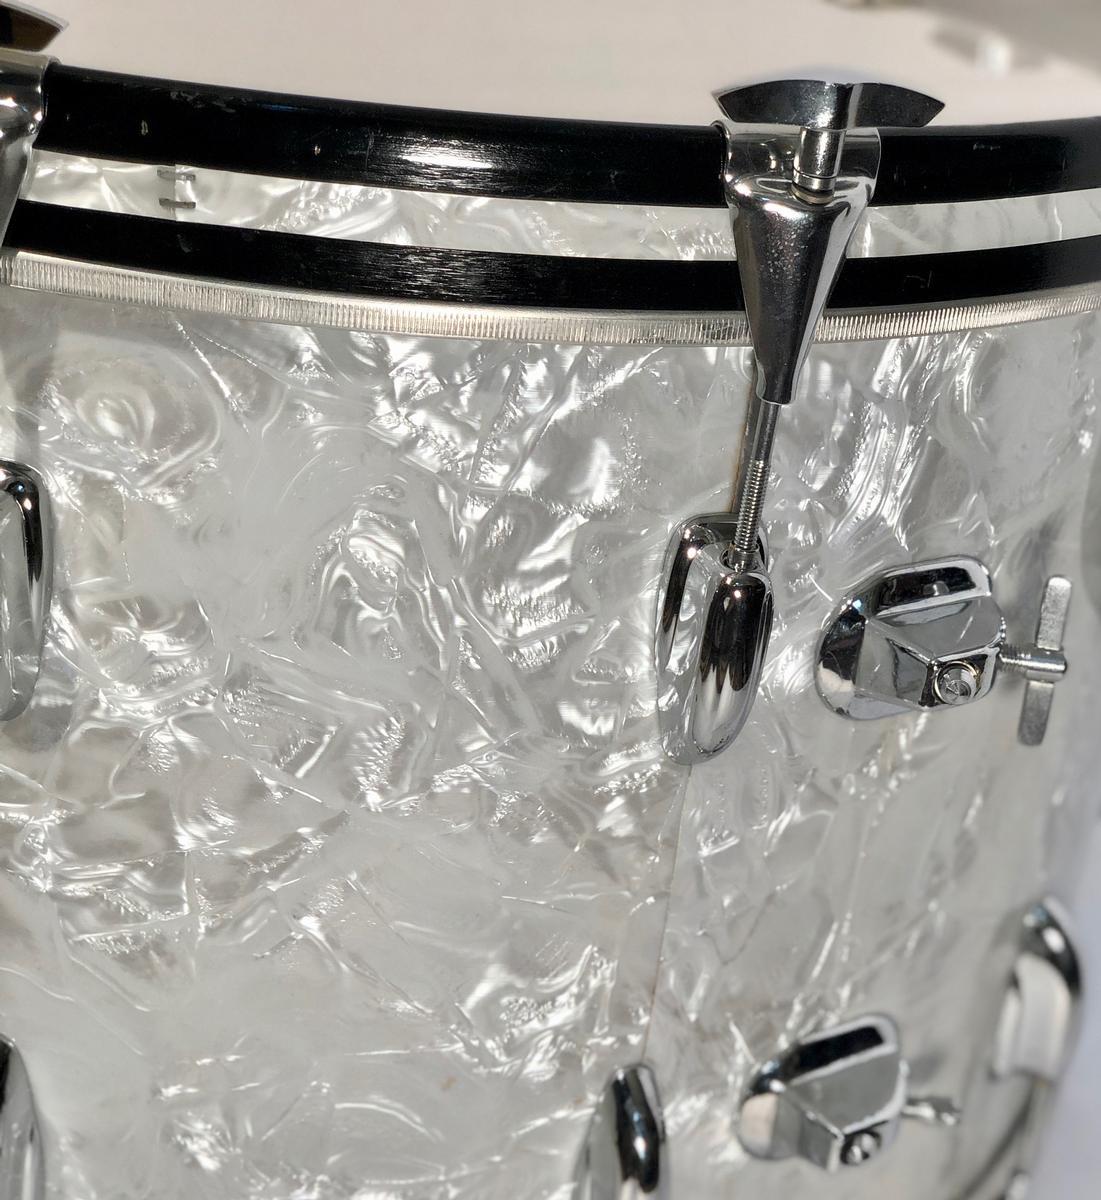 Gene Krupa's last bass drum, Gene Krupa's drums, famous jazz drummers, jazz memorabilia, jazz collectables